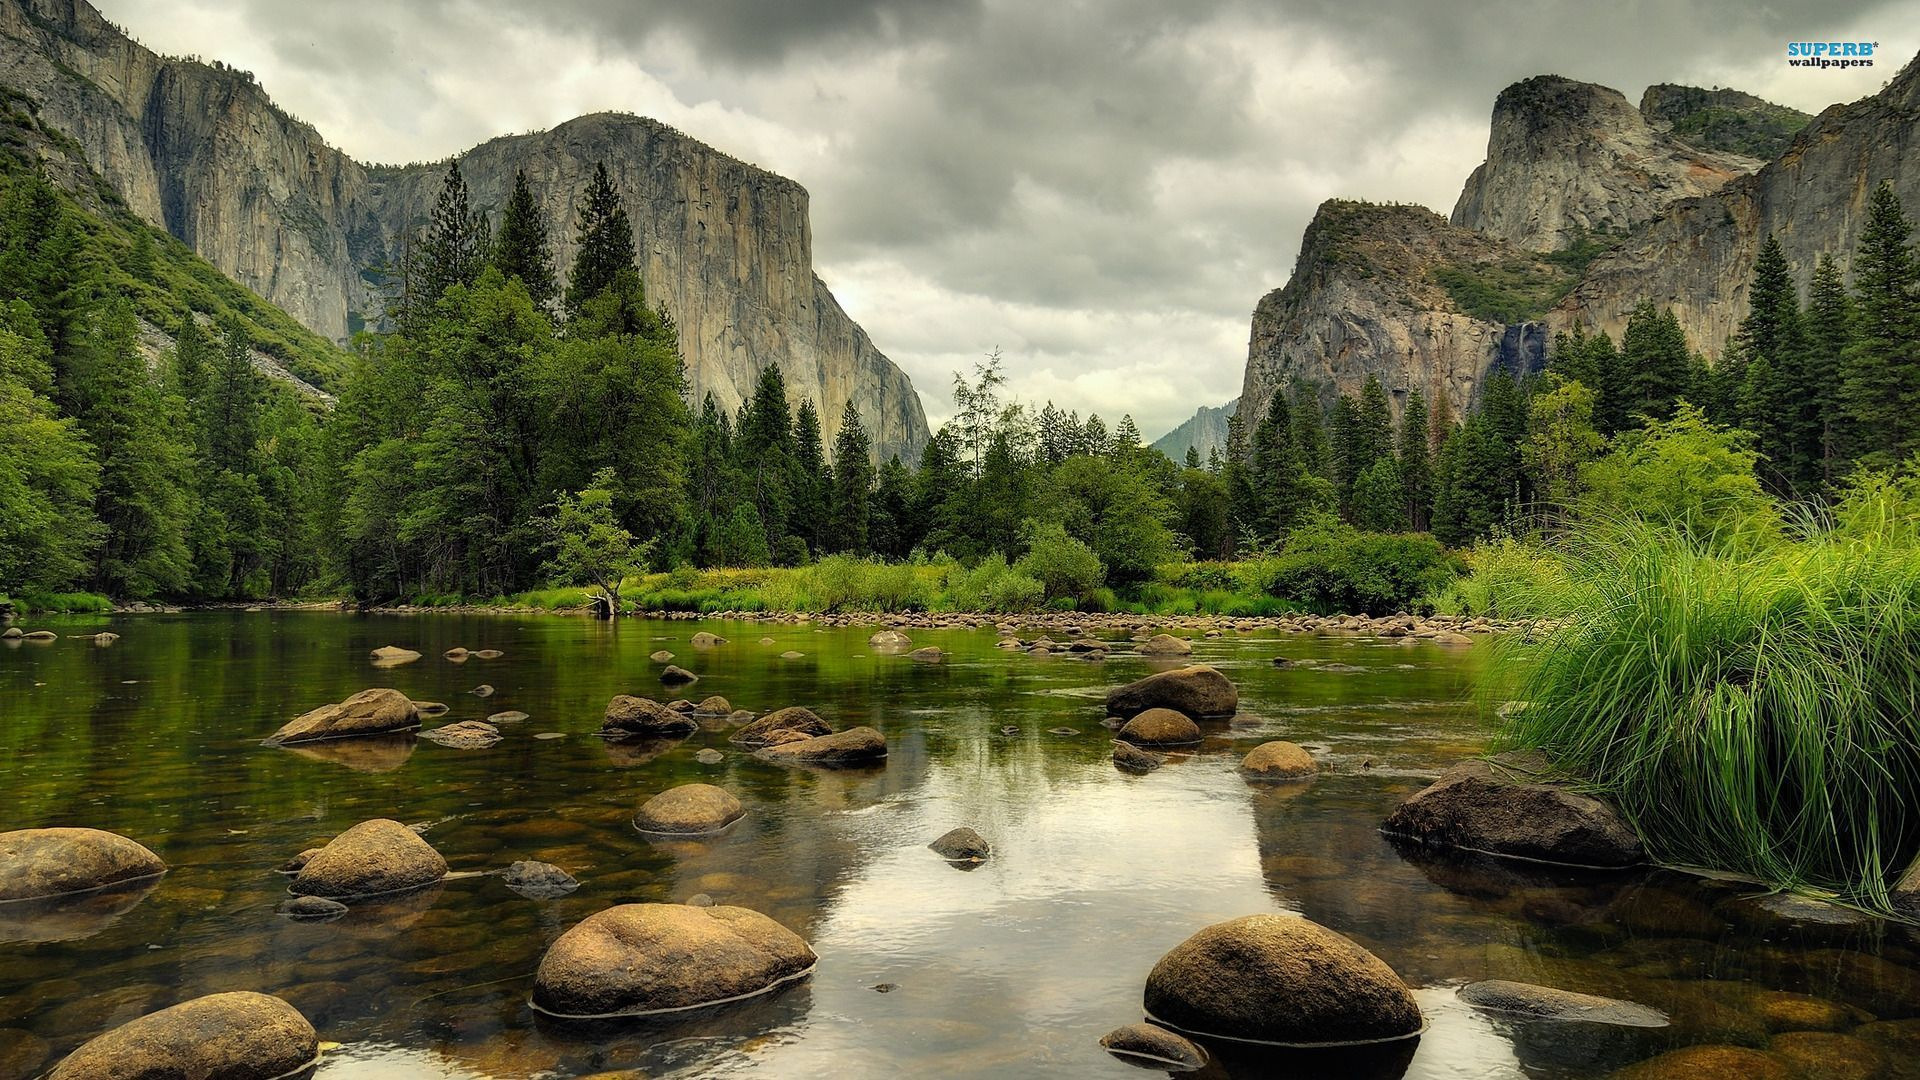 Yosemite Mountain Landscape Wallpaper HD 11 High Resolution Wallpaper 1920x1080